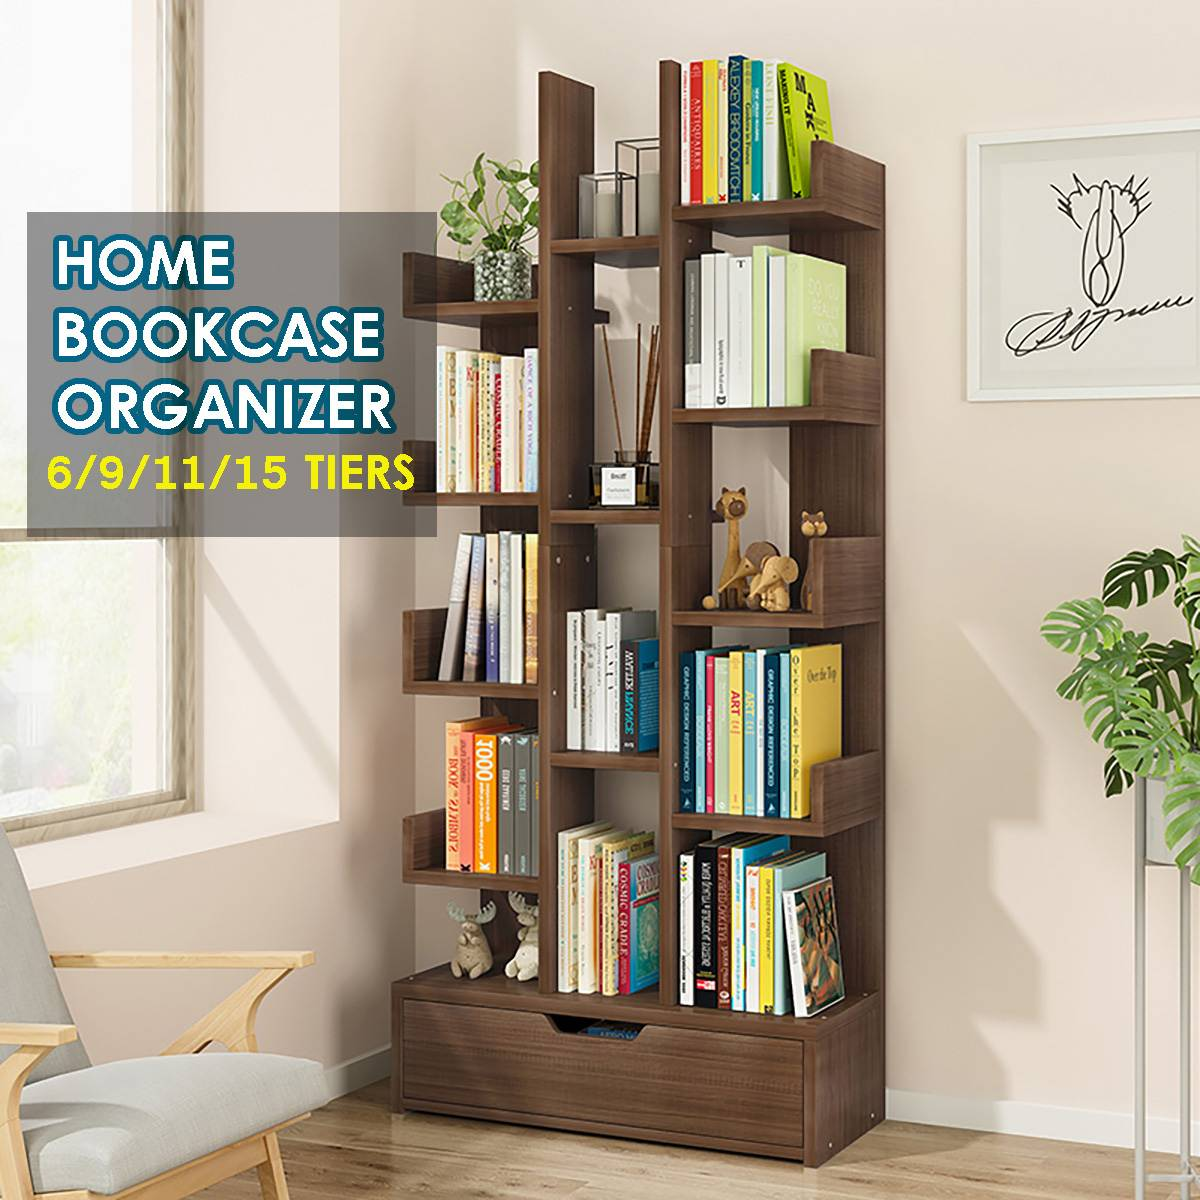 Bücherregale Buch-Rack Display-Regal Möbel-Decor Studie-Bücherregal Holz Baum-Shaped Multi-Grid